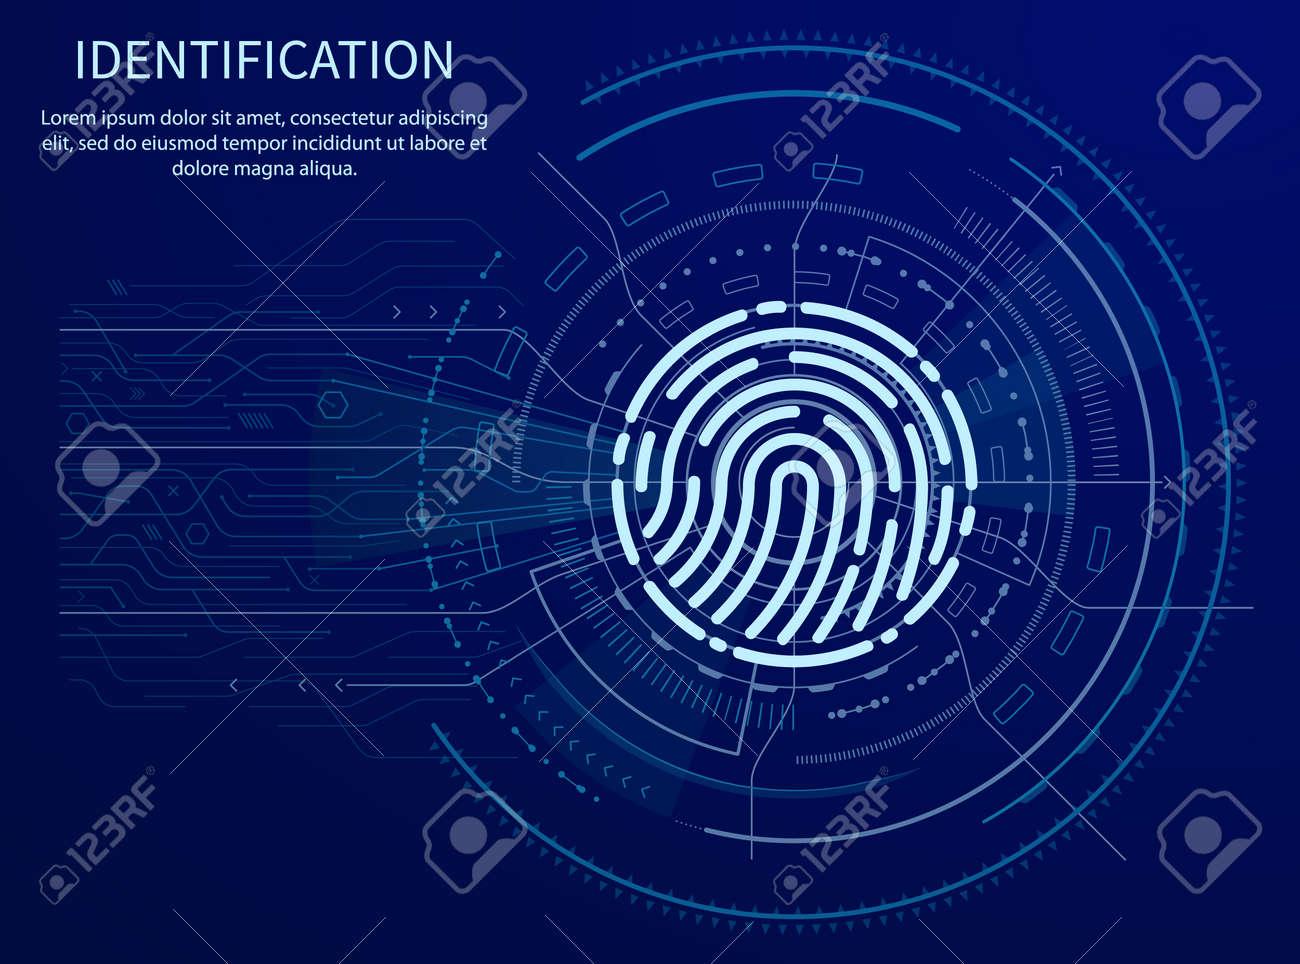 Identification Fingerprint Poster Illuminated Data - 116328260